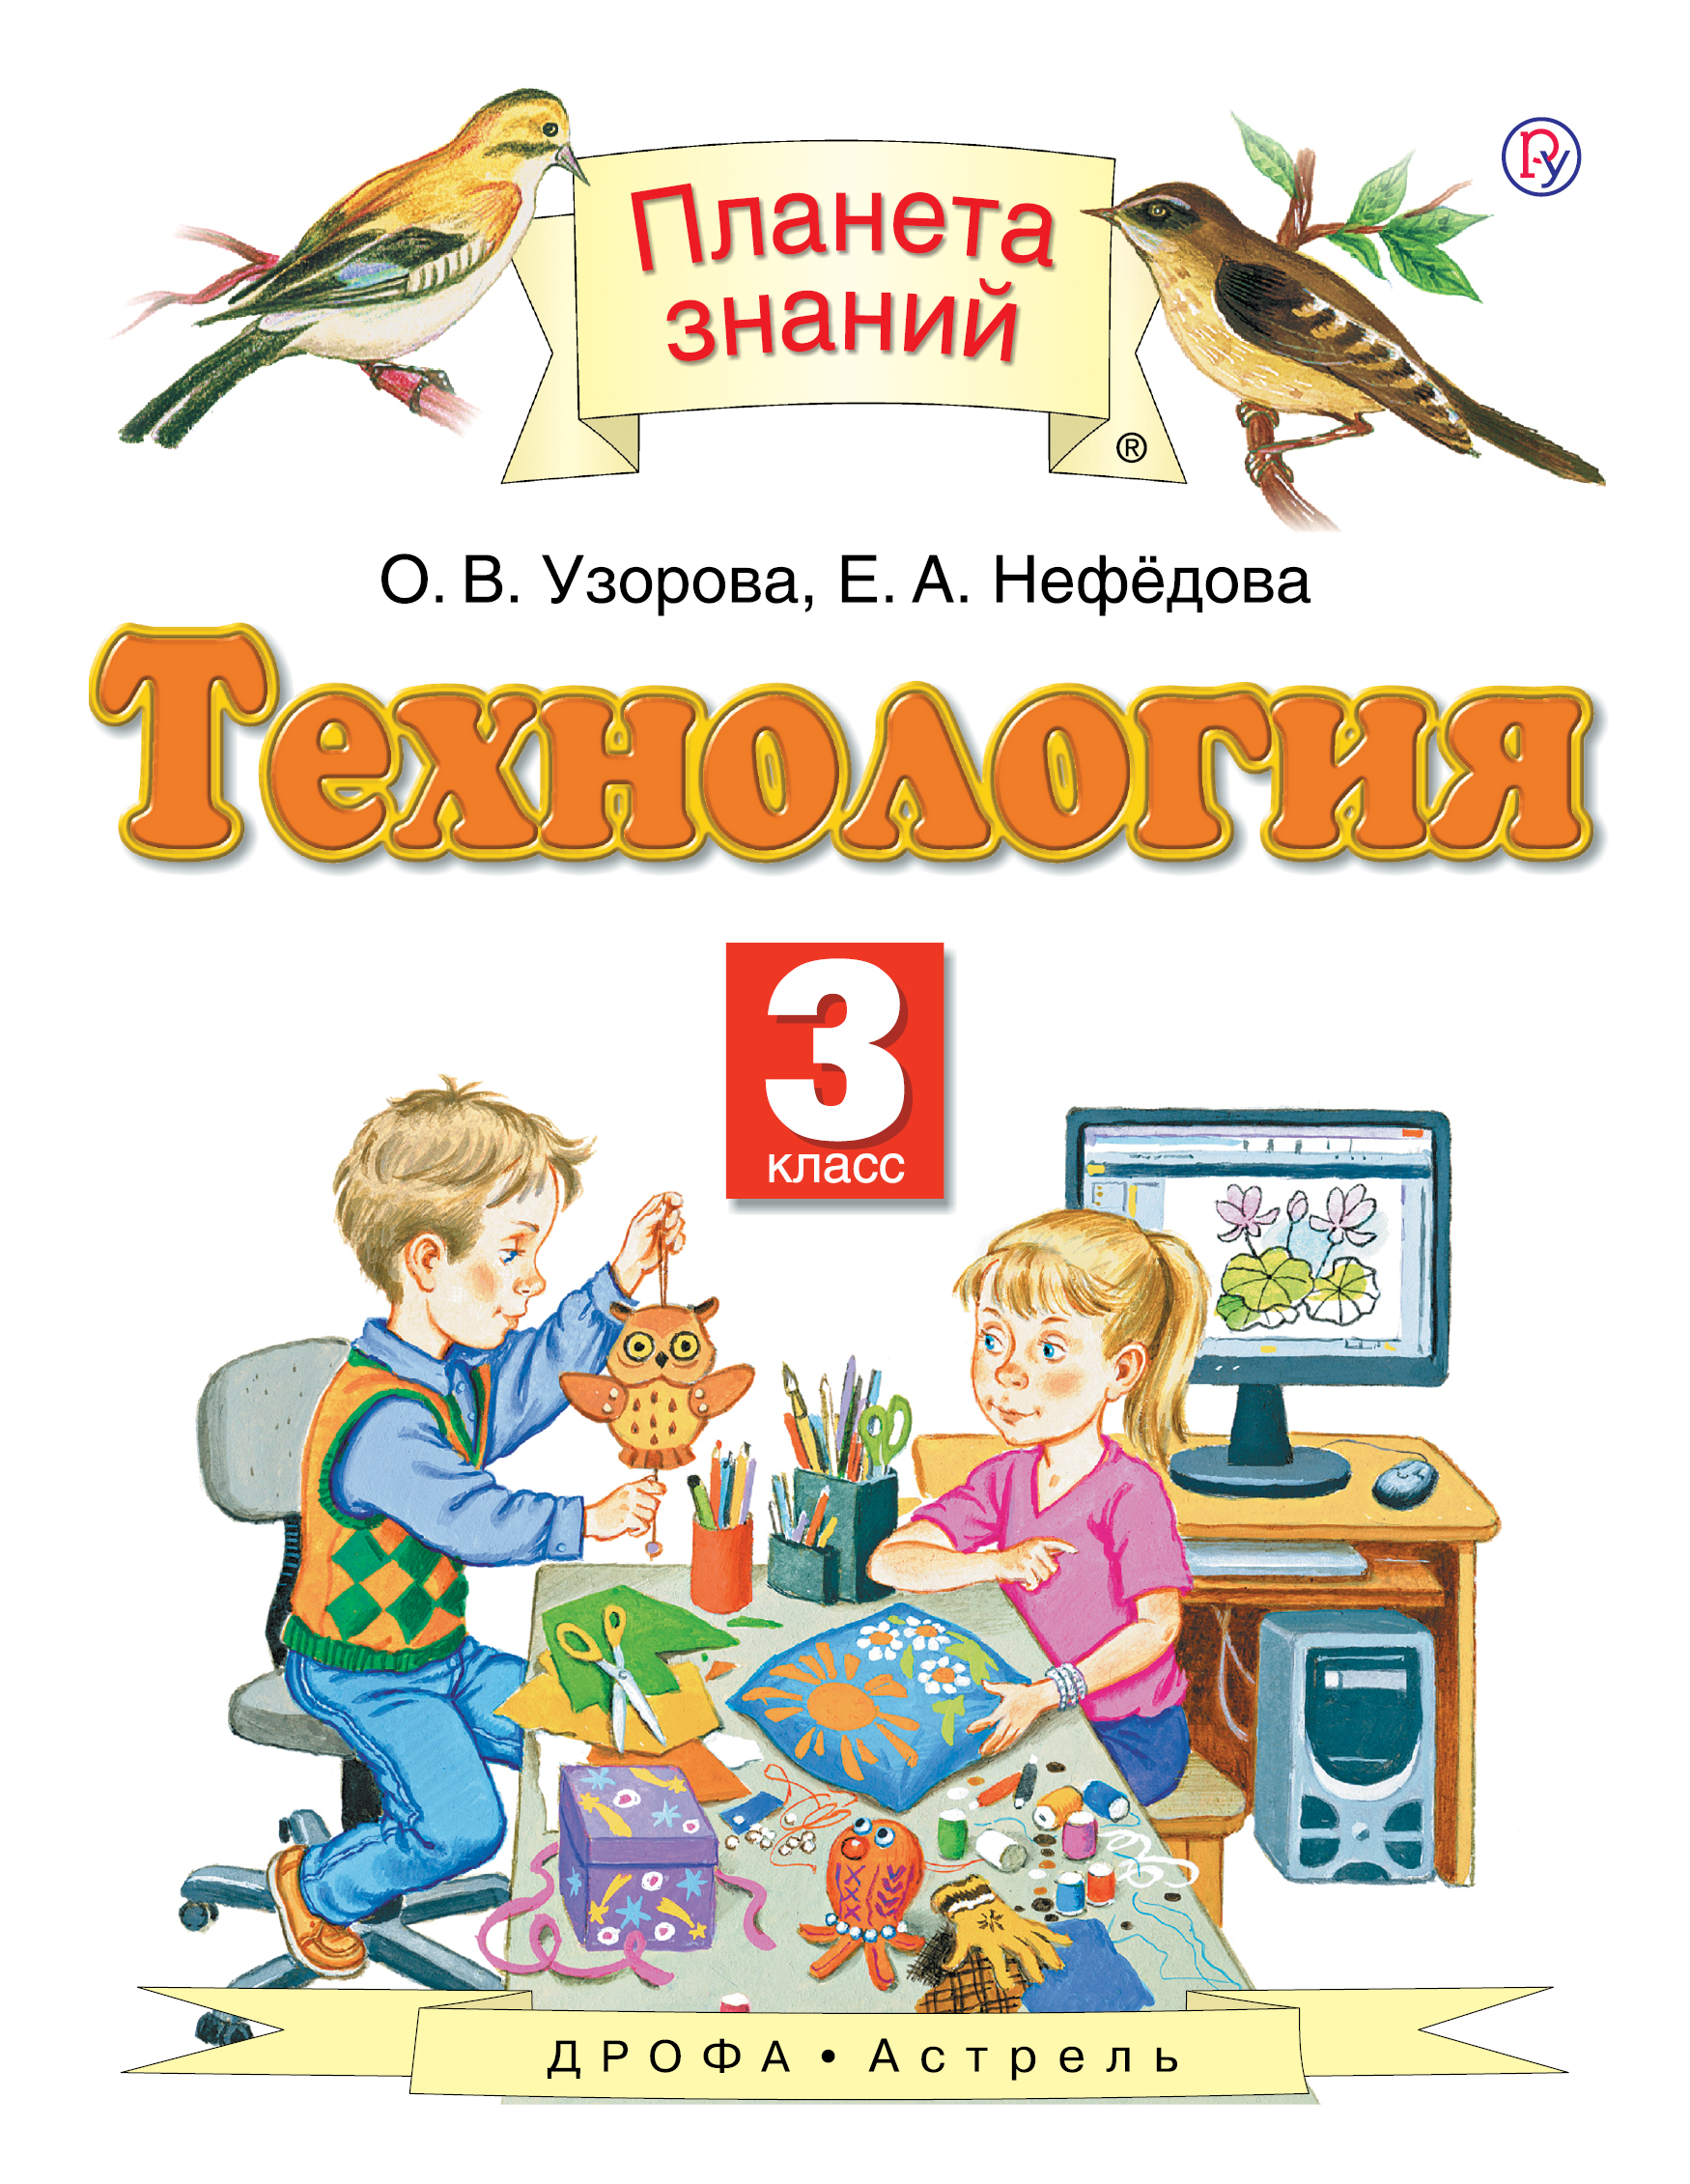 Узорова Ольга Васильевна; Нефедова Елена Алексеевна Технология. 3 класс. Учебник